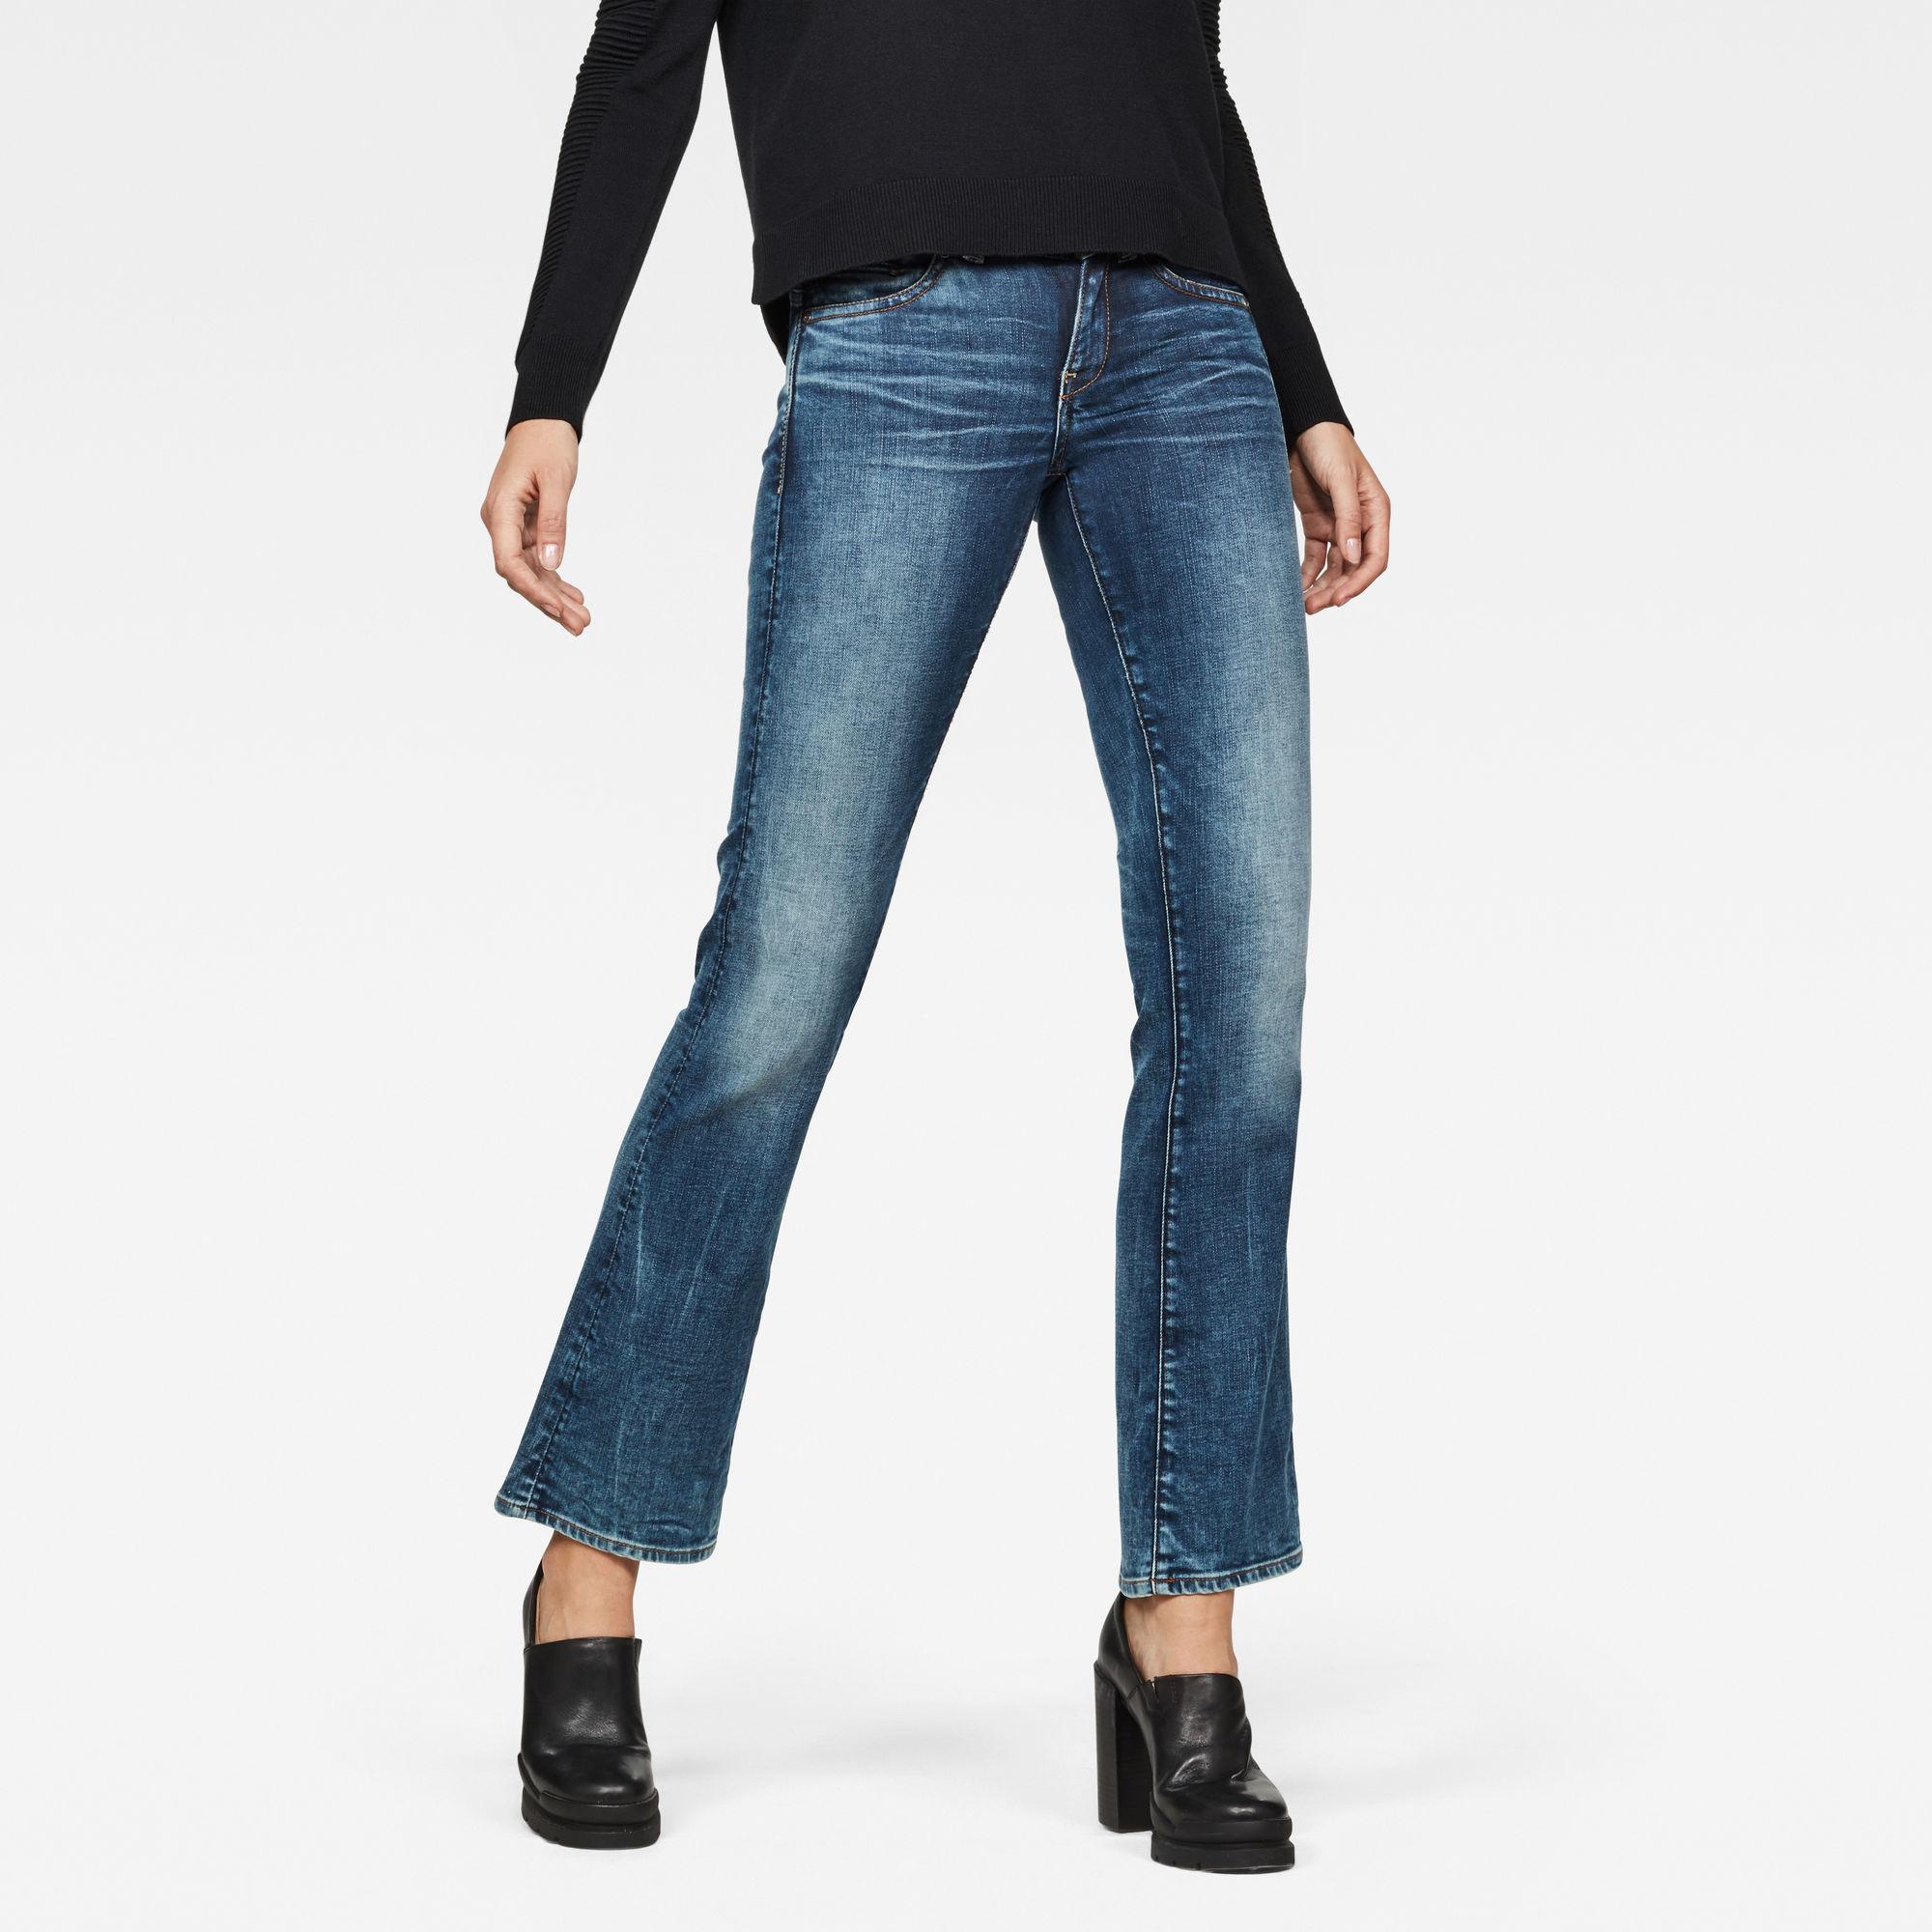 Midge Saddle Mid Waist Skinny Bootcut Jeans Jeans maat 30-30 van G-Star RAW snel en voordelig in huis? Hier lukt het direct